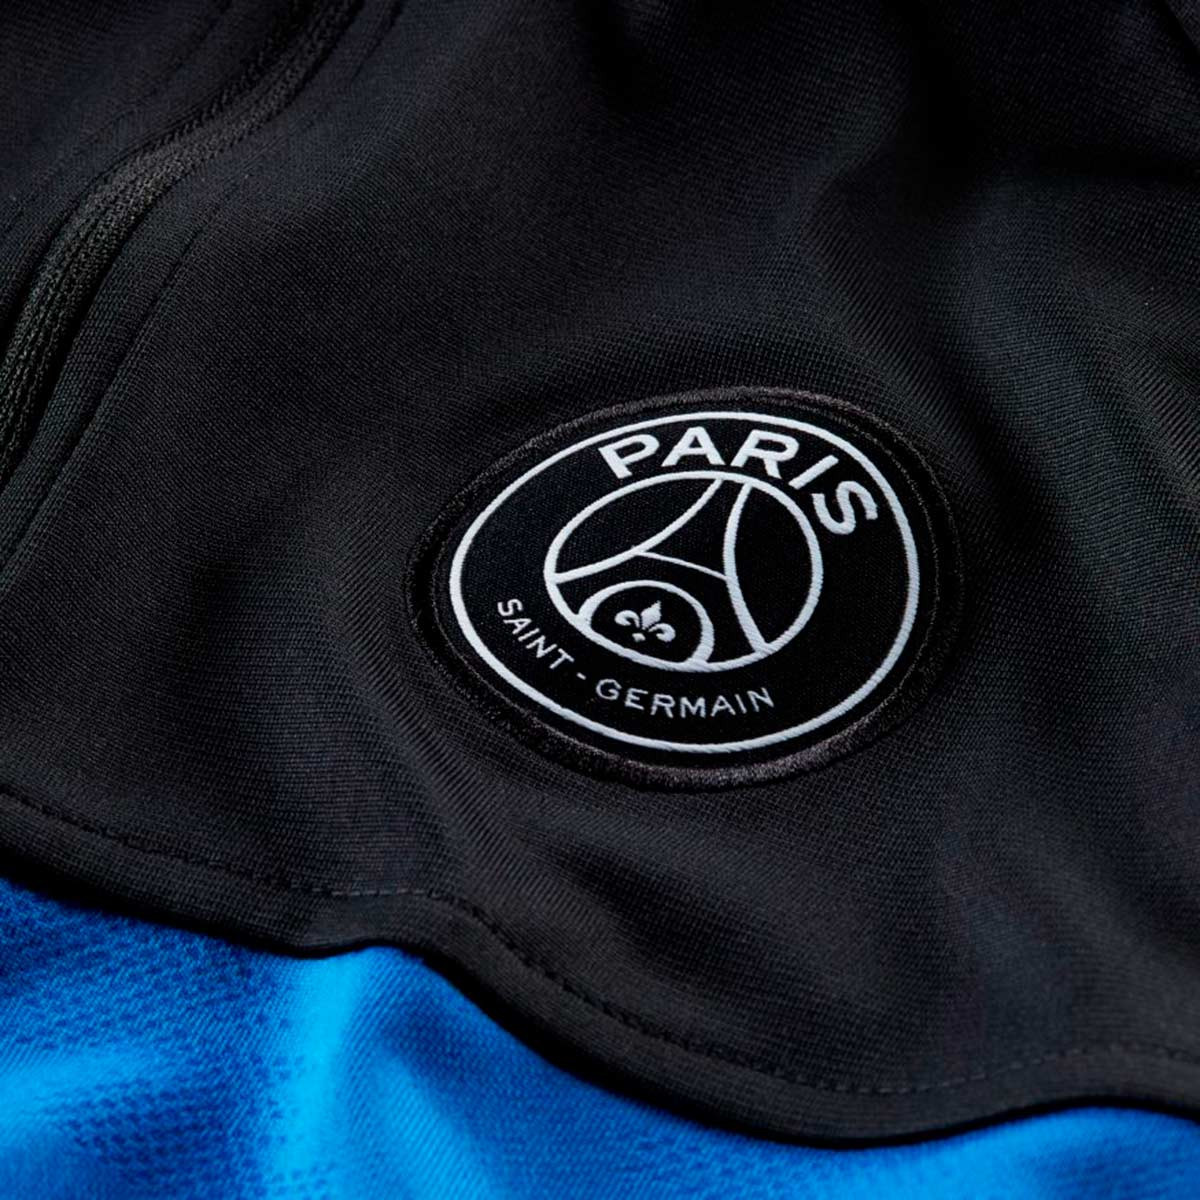 Profeta Ejemplo Partina City  Tracksuit Nike Jordan x PSG Dry Strike Cuarta Equipación 2019-2020 ...